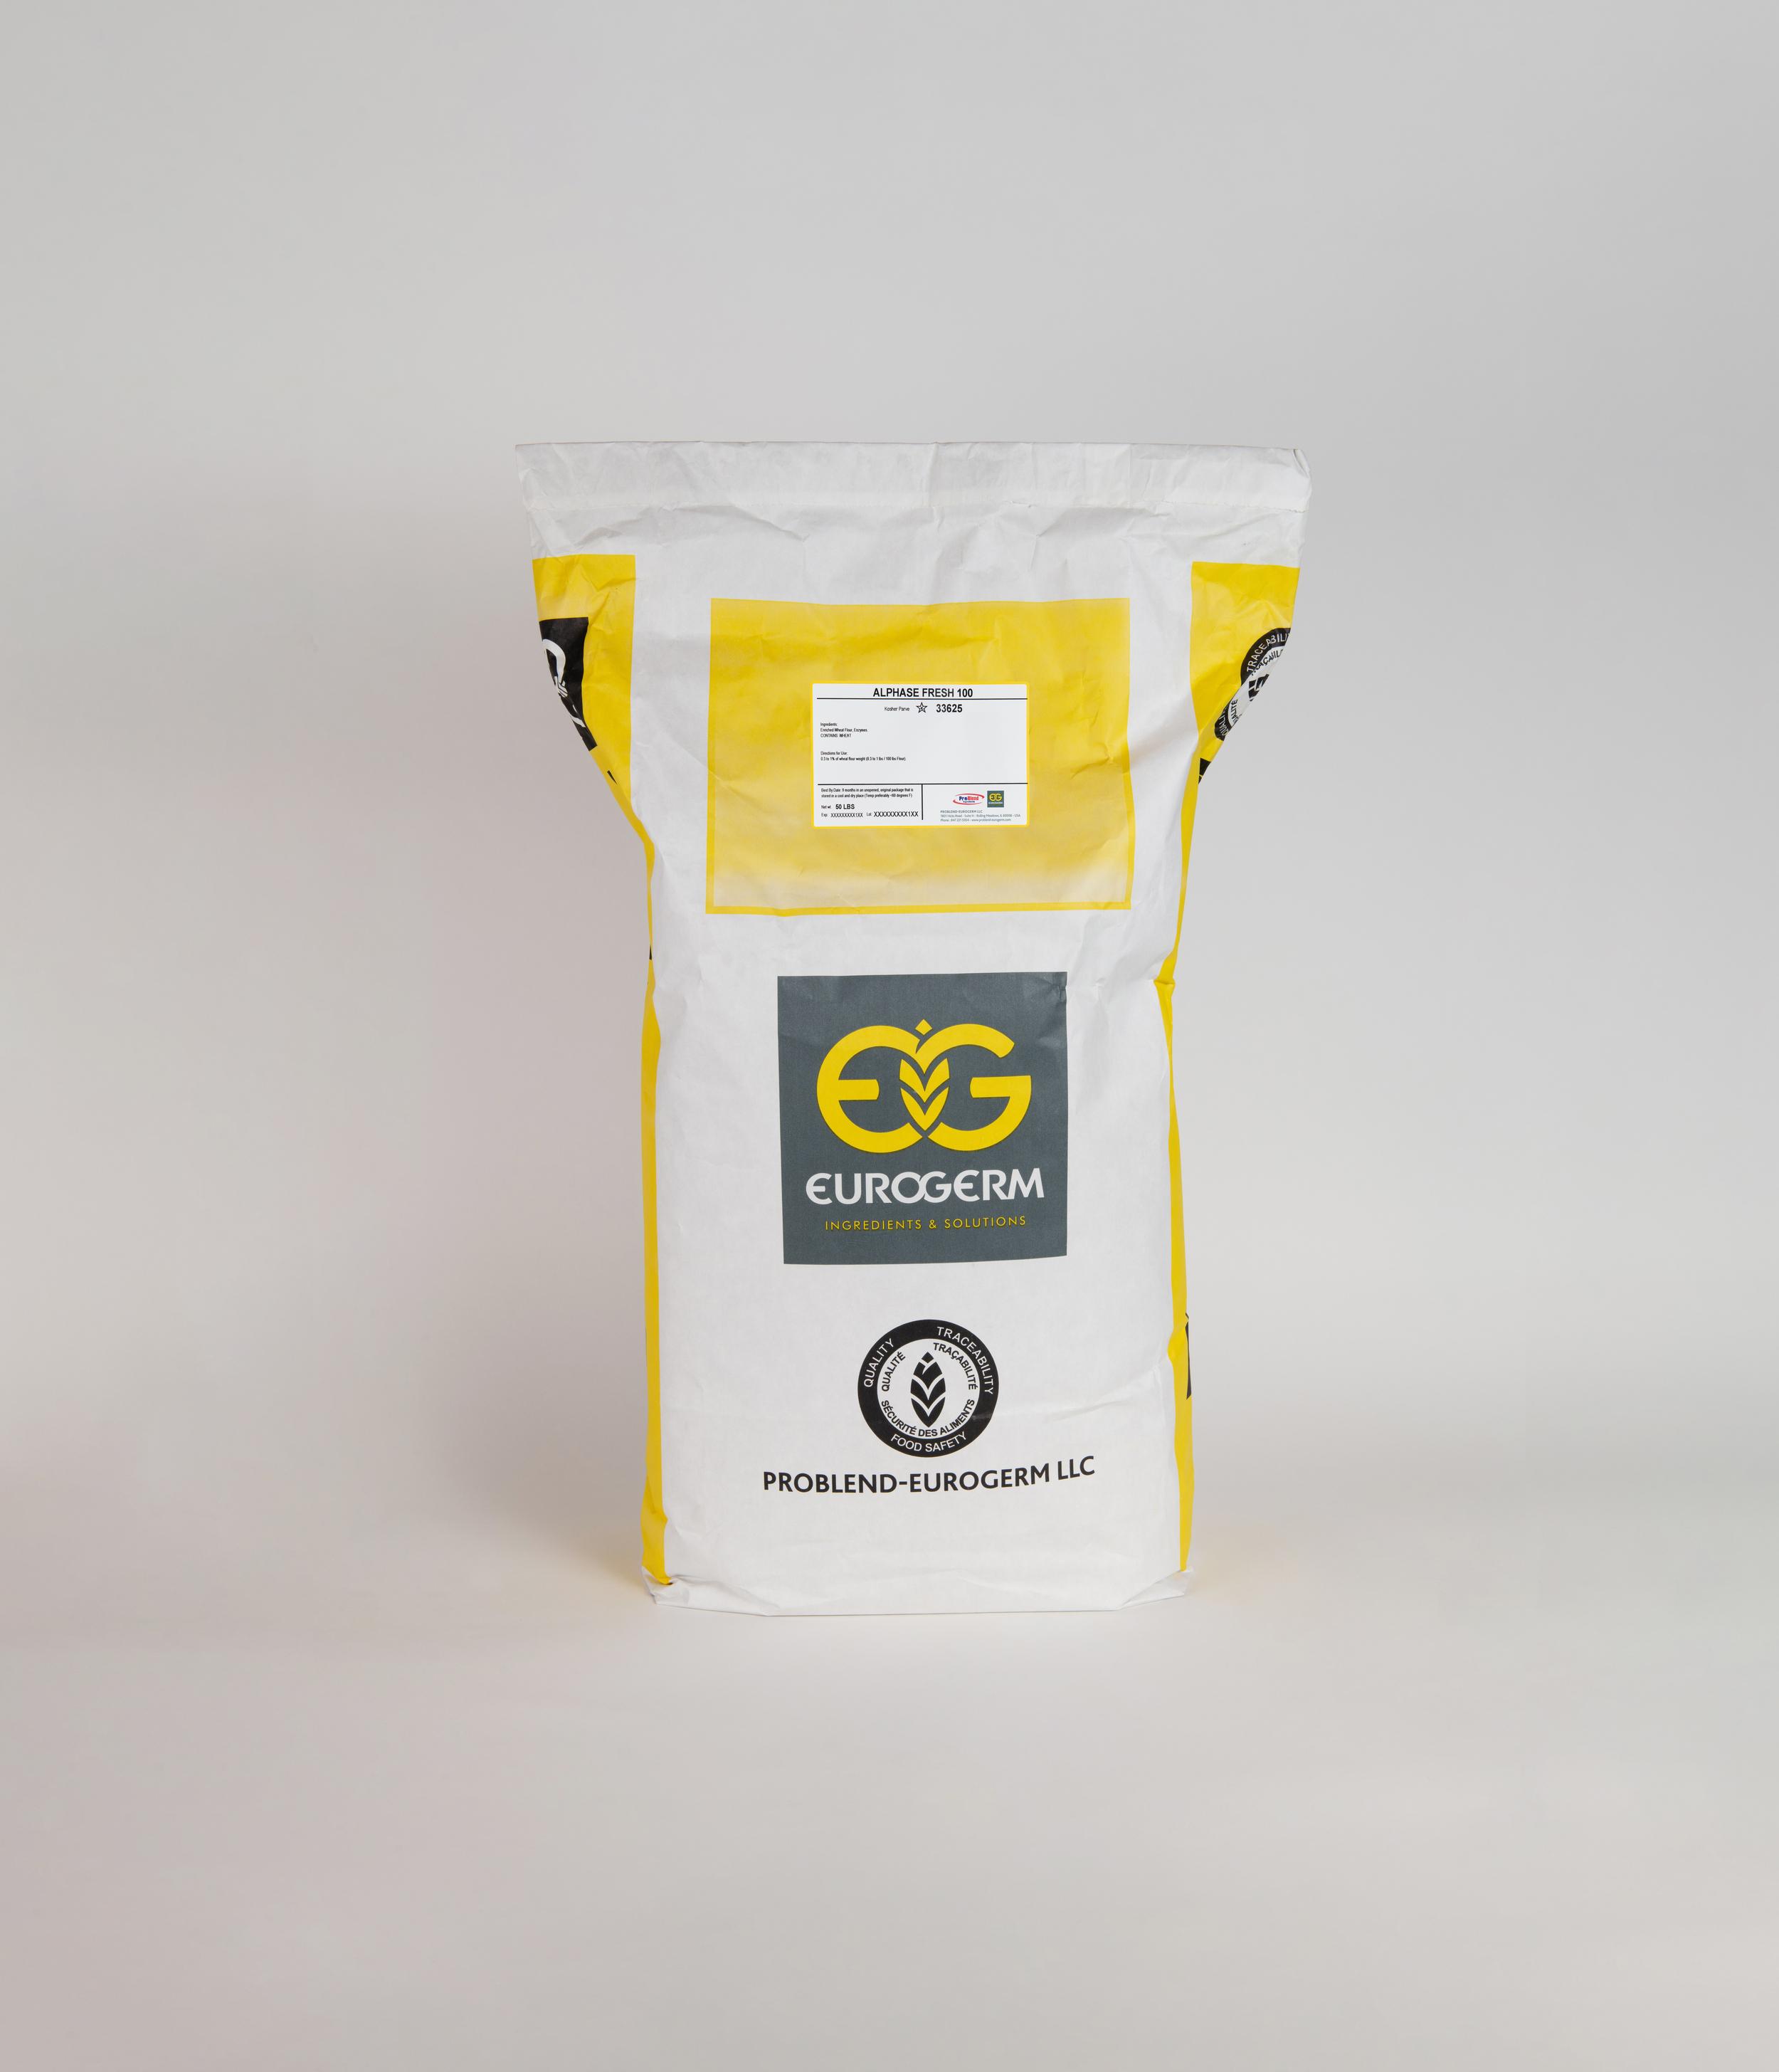 Alphase Fresh 100 - Clean Label Shelf life Extender (Item #33625 Eurogerm) main image